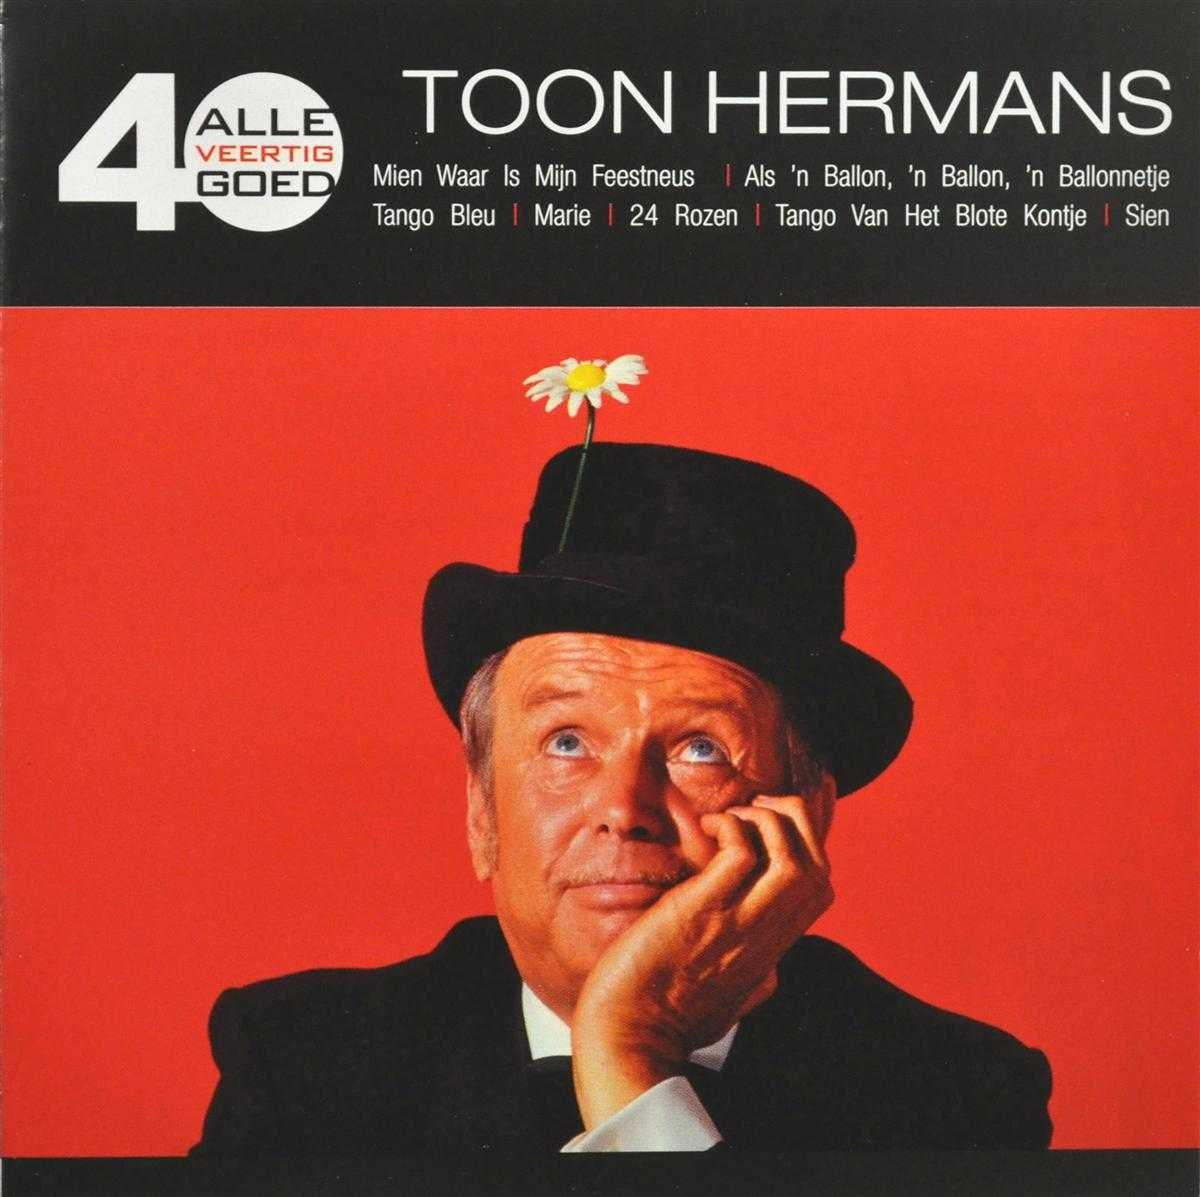 Bolcom Alle 40 Goed Toon Hermans Cd Album Muziek